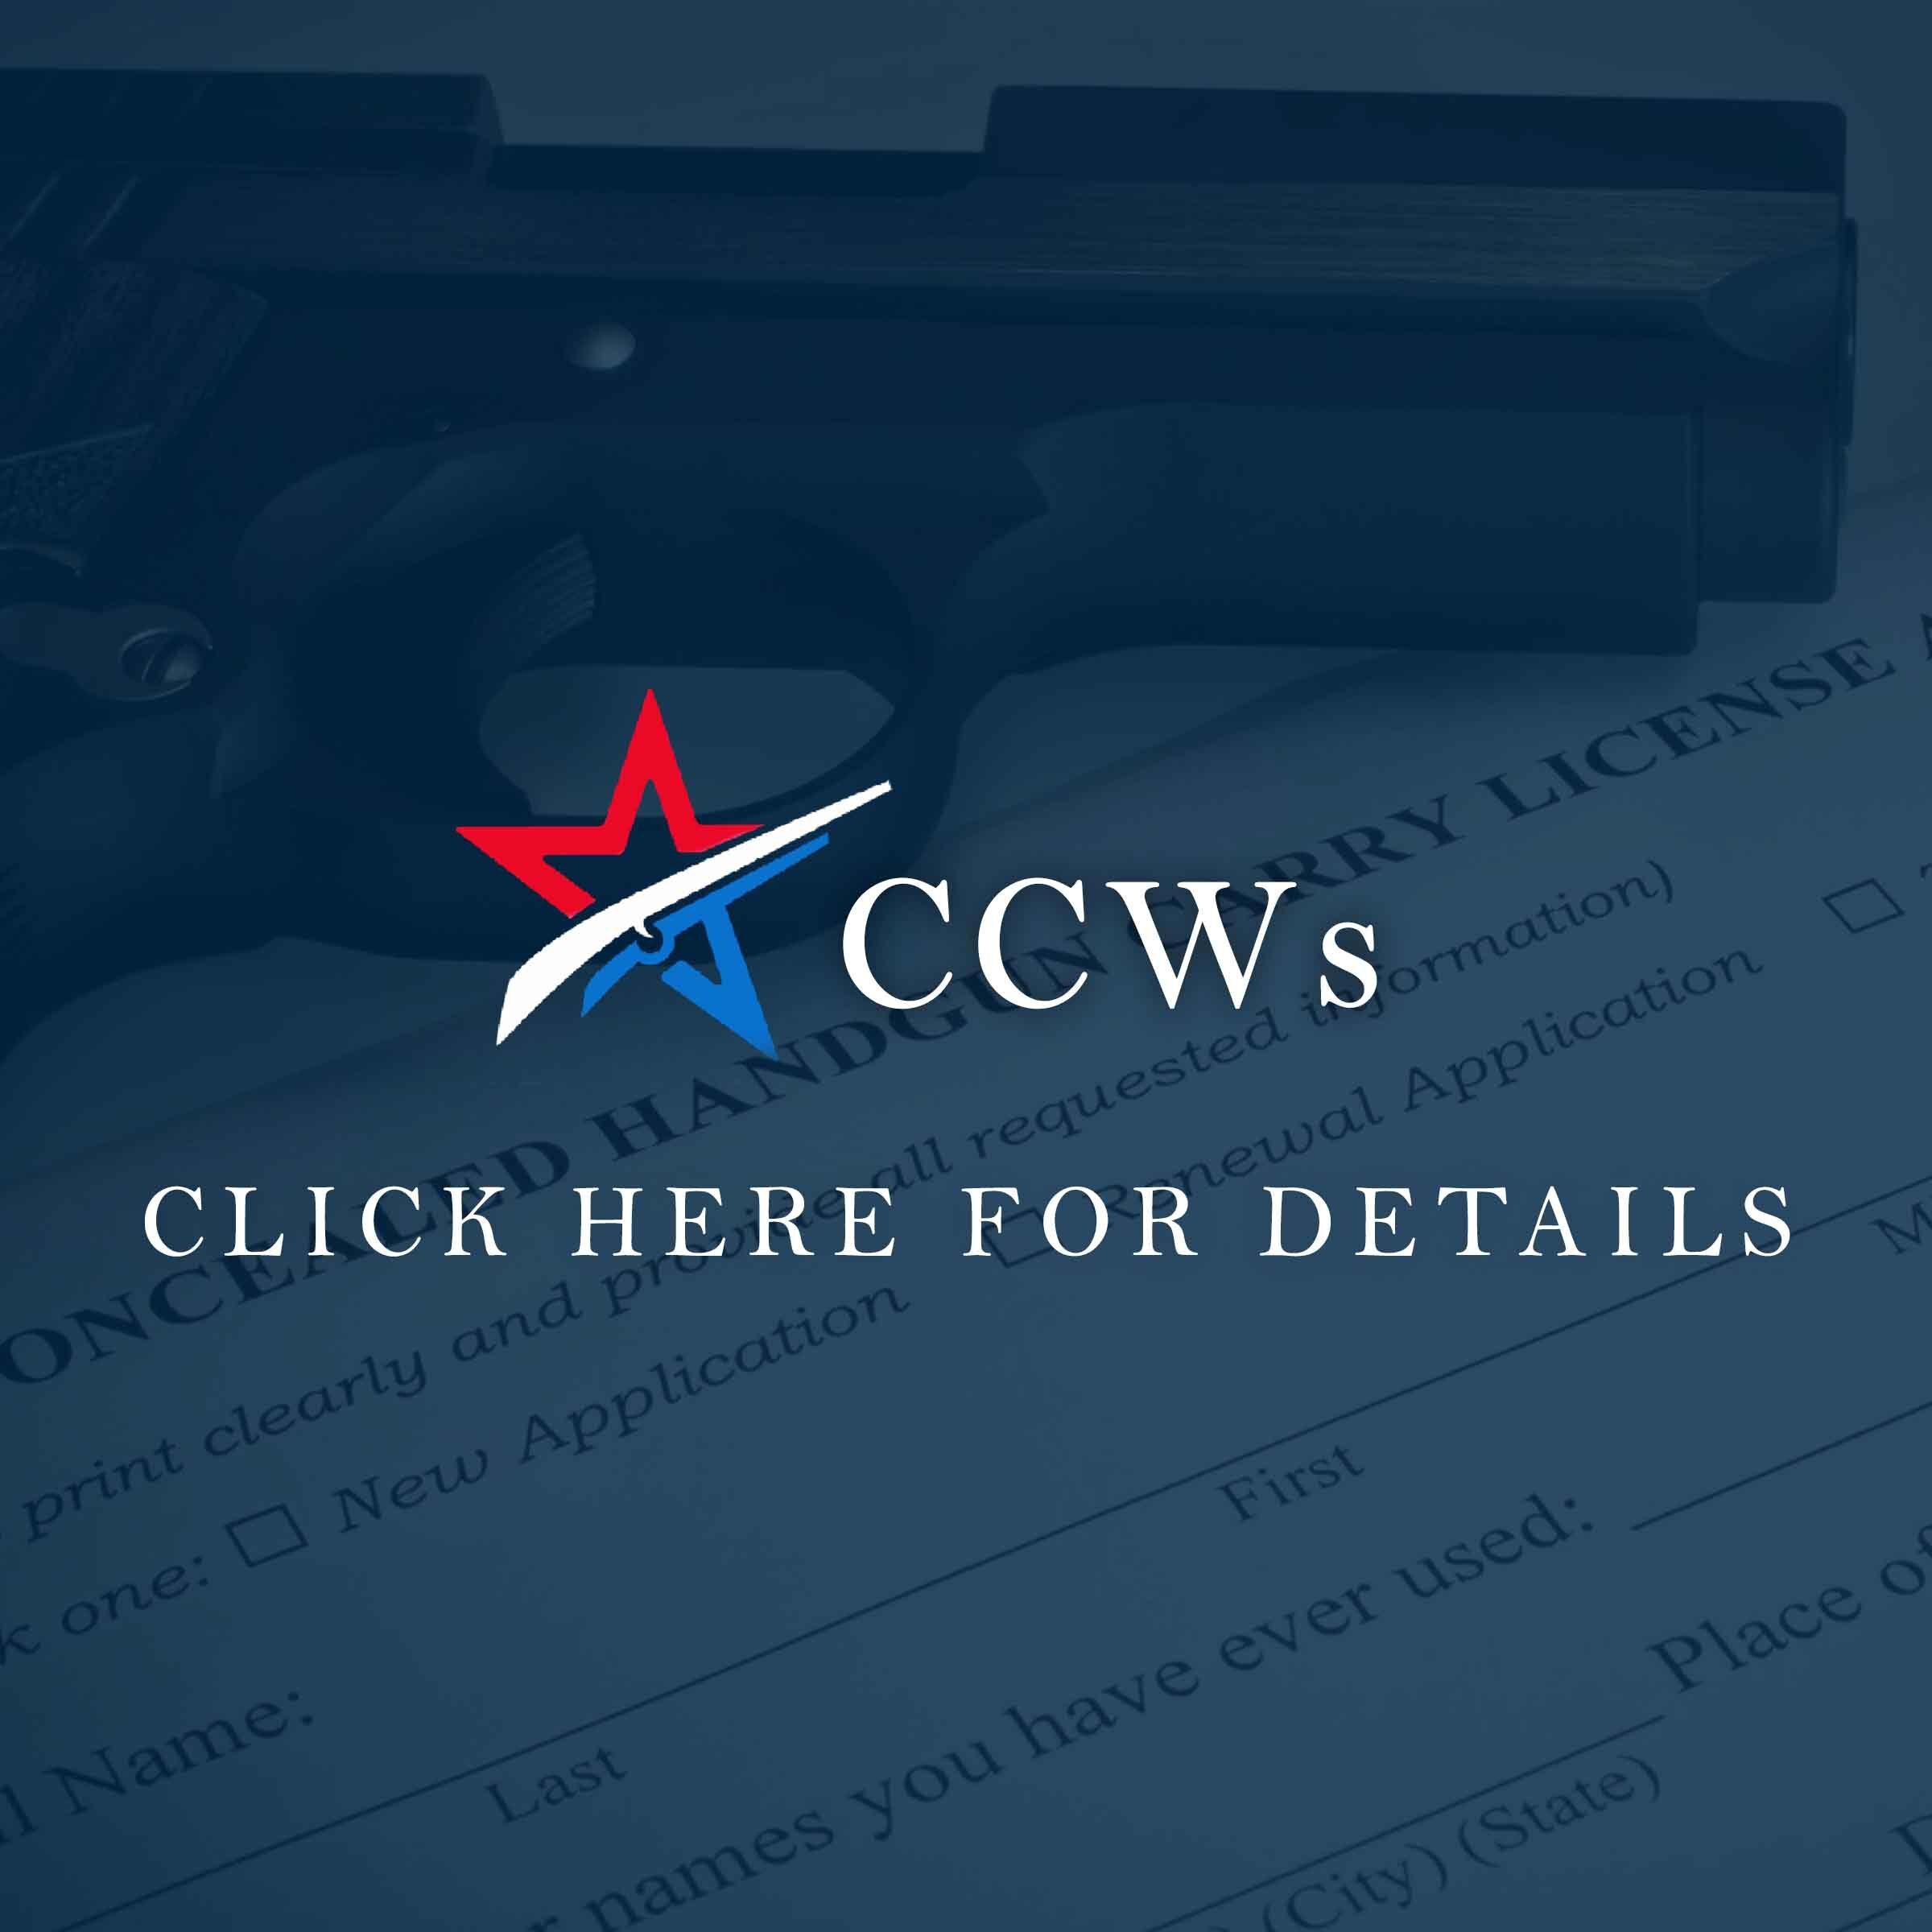 CCWs in San Diego